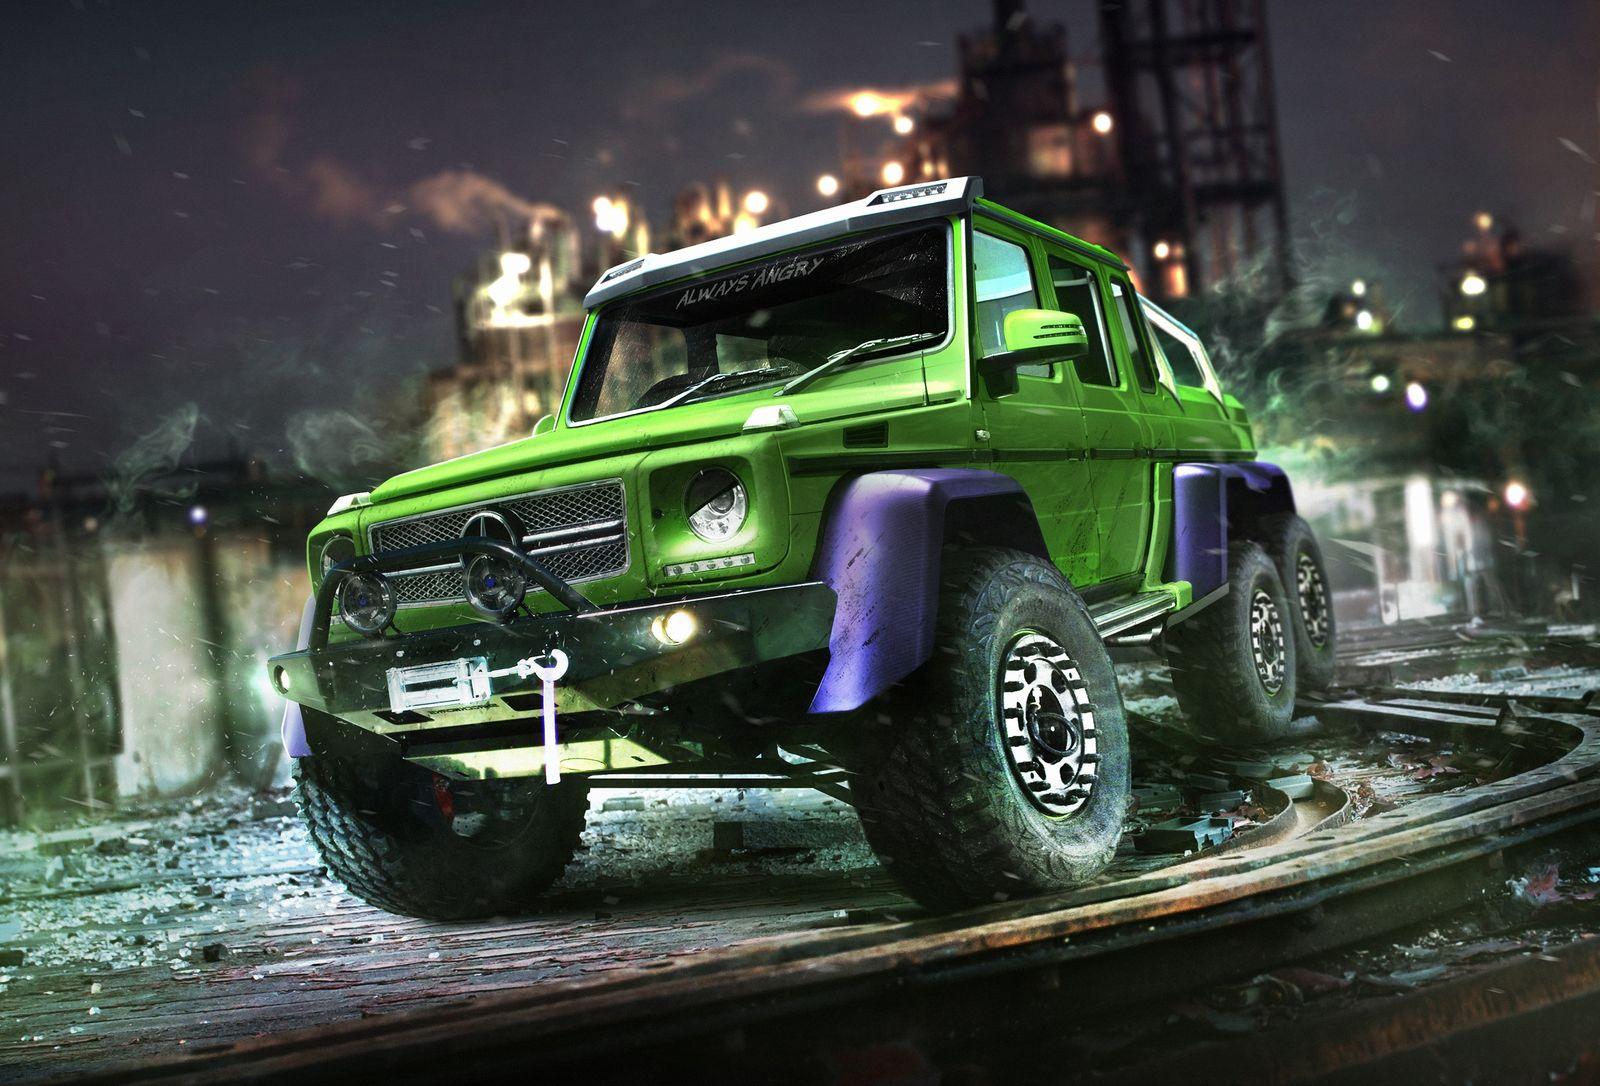 Hulk Mercedes G 63 6x6 Legendary Green Superhero Found